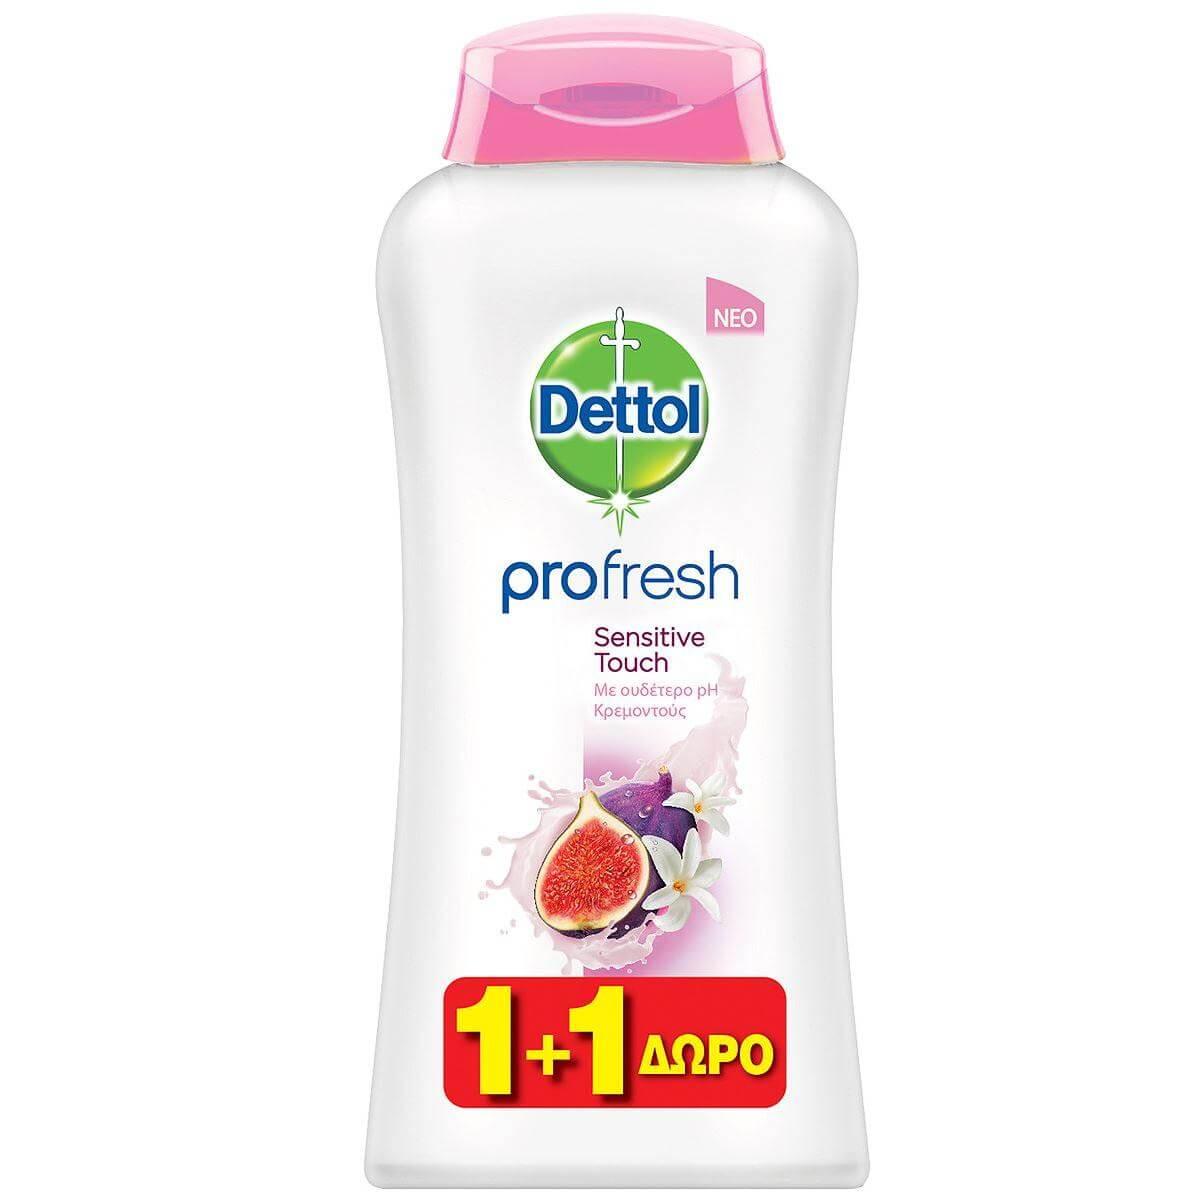 Dettol Profresh Sensitive TouchΑφροντούς με Αίσθημα Φρεσκάδας 1+1 Δώρο 500ml